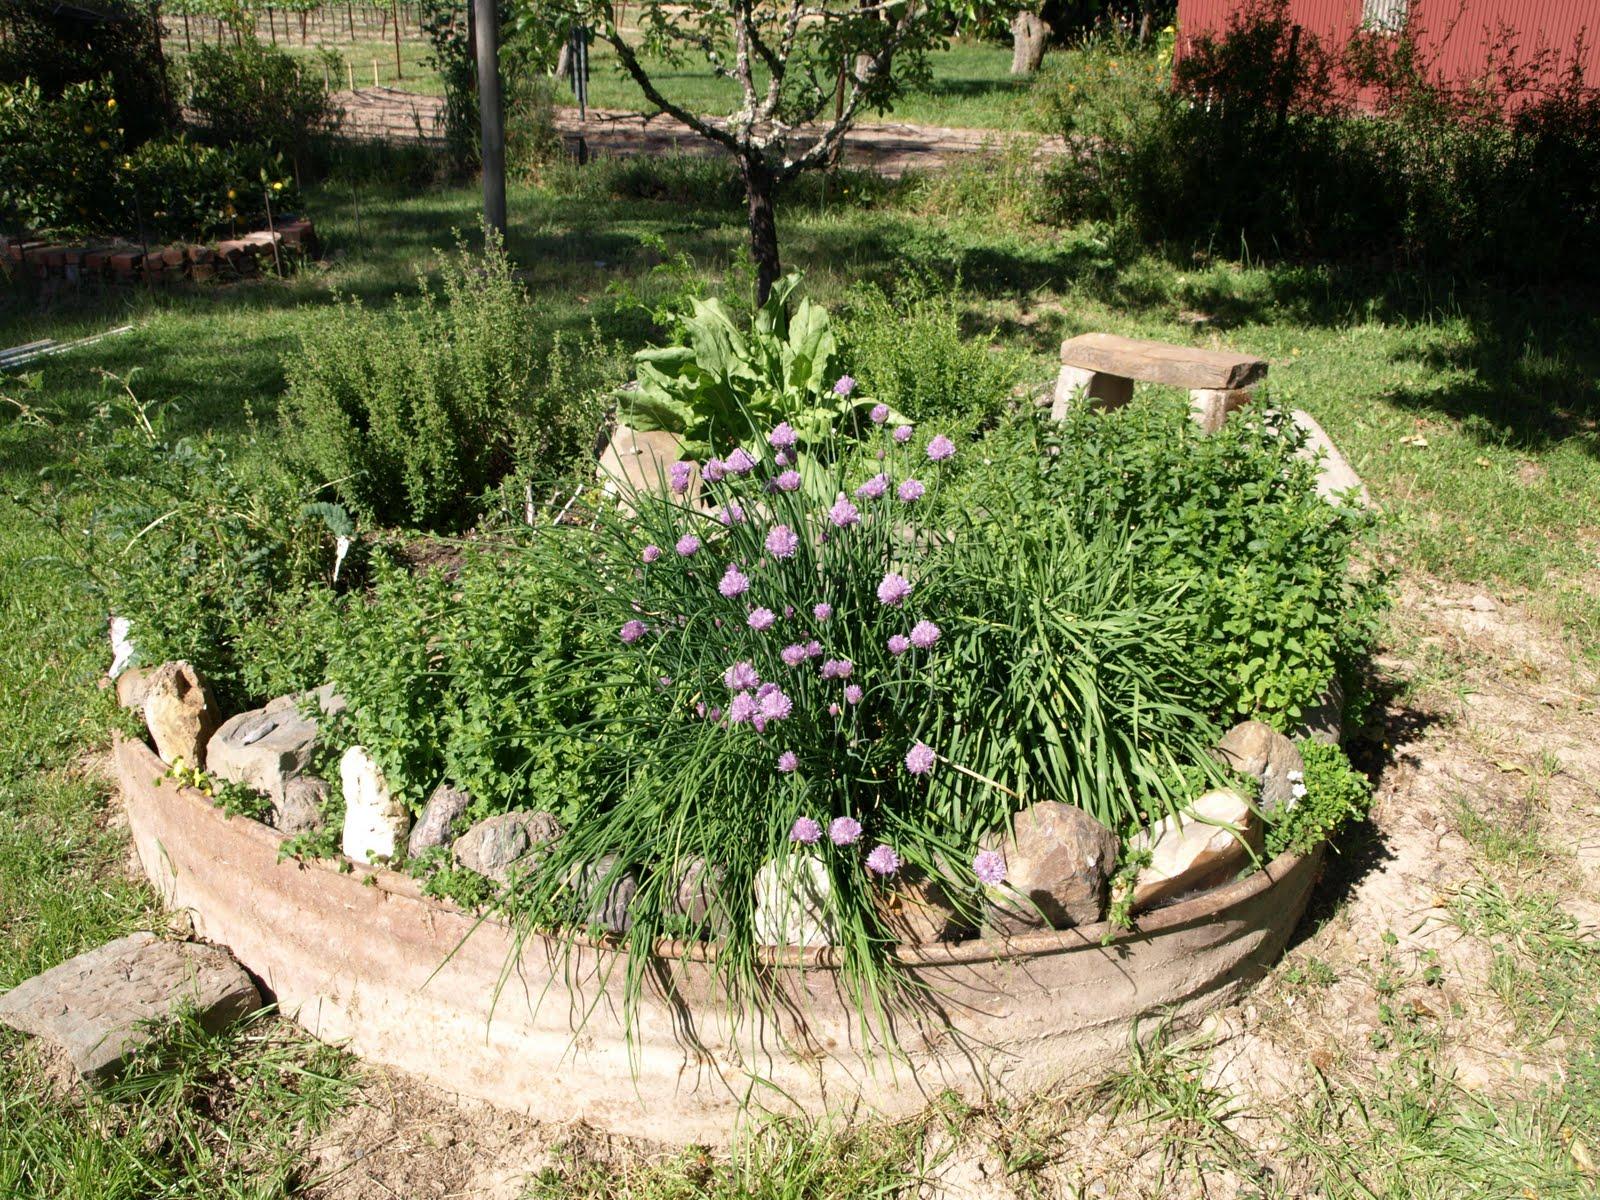 Shelley macdonald designs may 2011 for Herb garden design